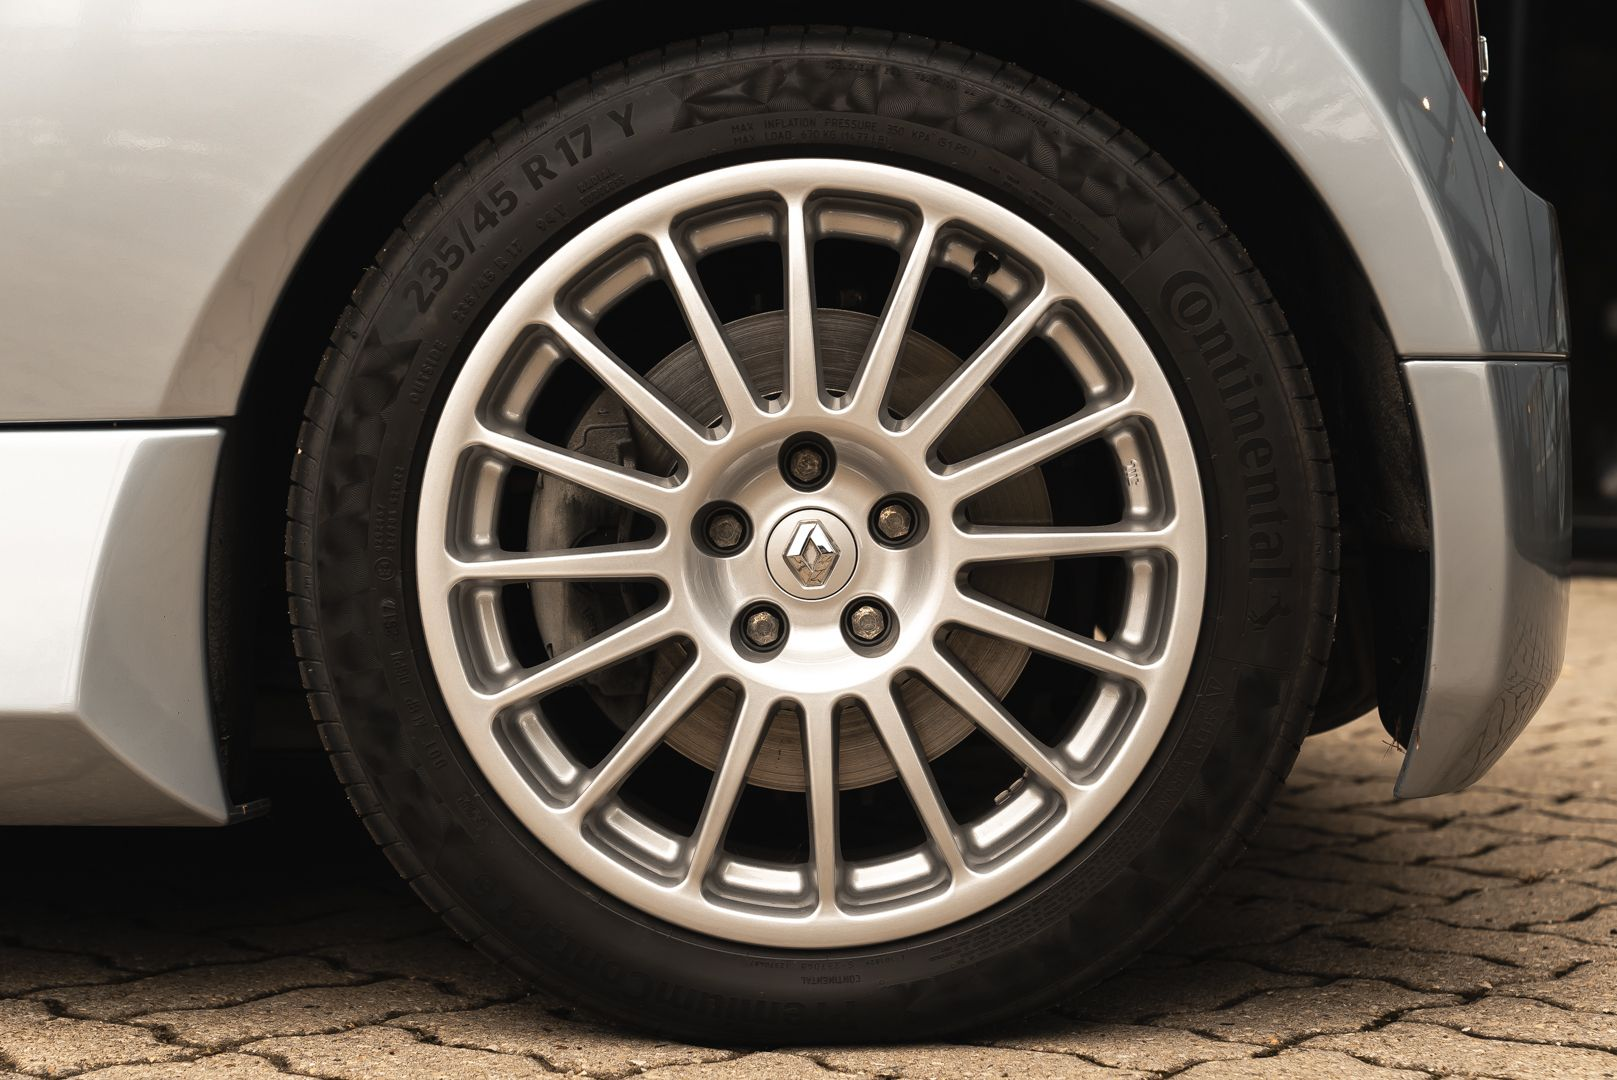 2002 Renault Clio 3.0 V6 Renault Sport Phase1 84929